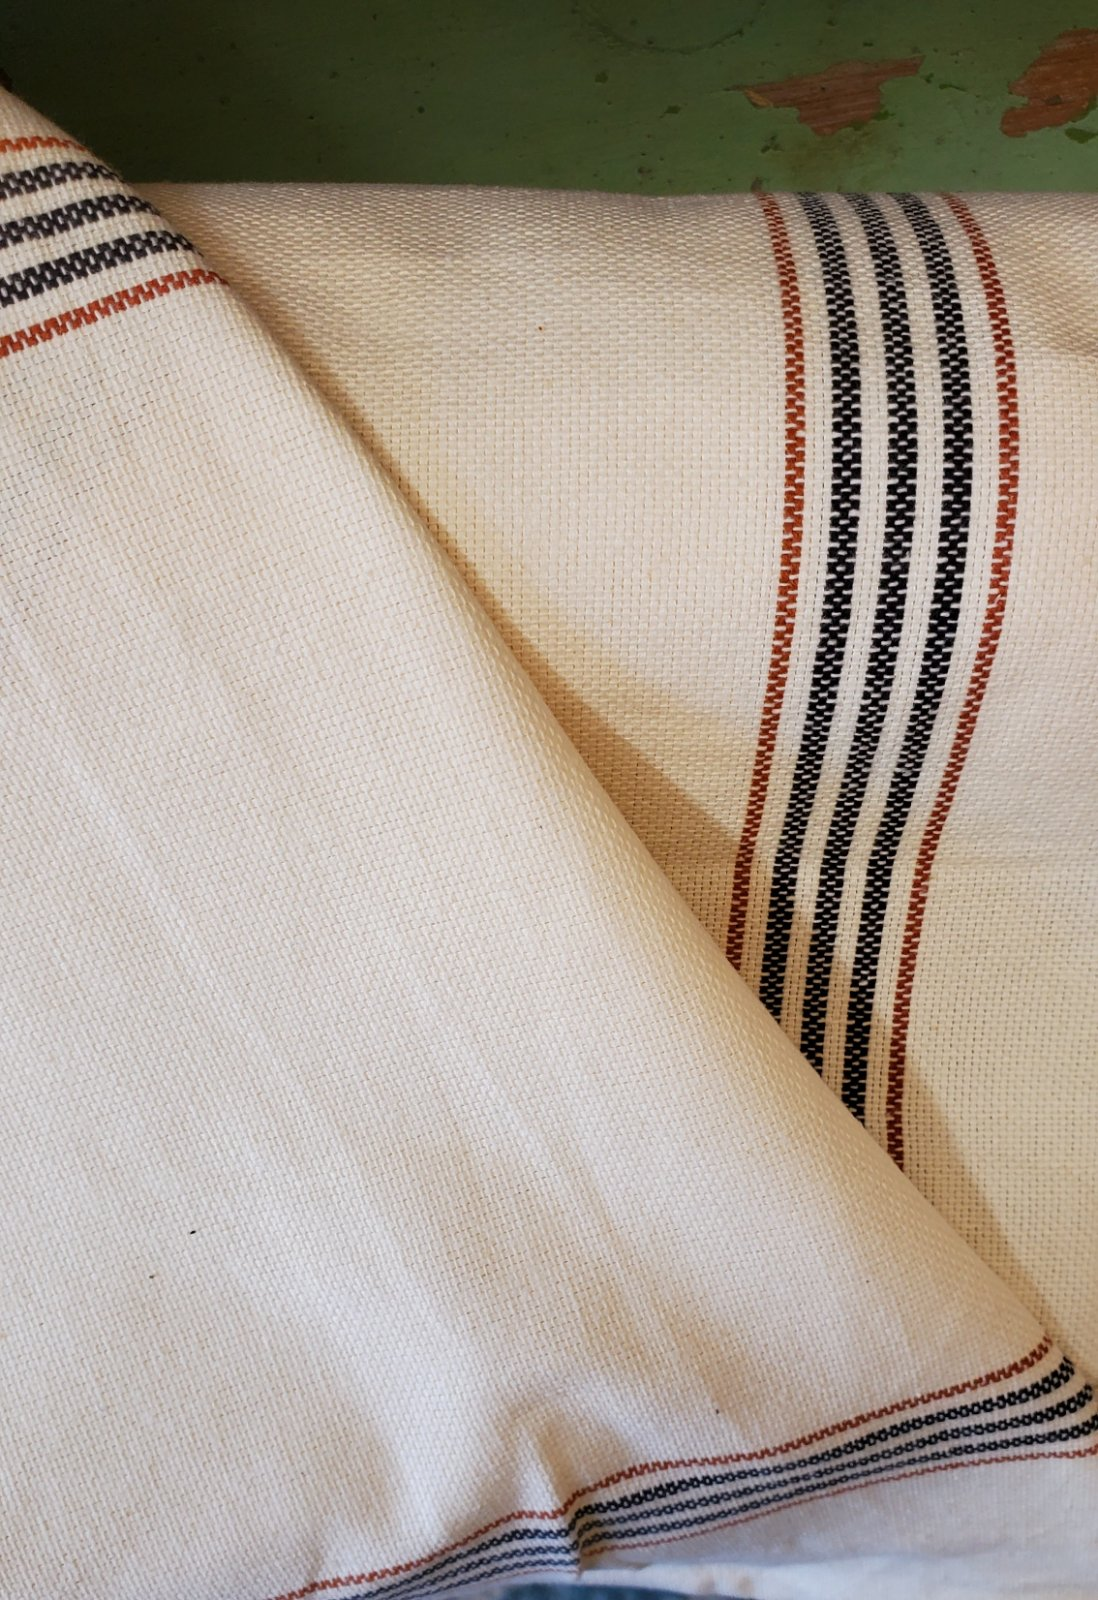 Orange and Black Striped Toweling